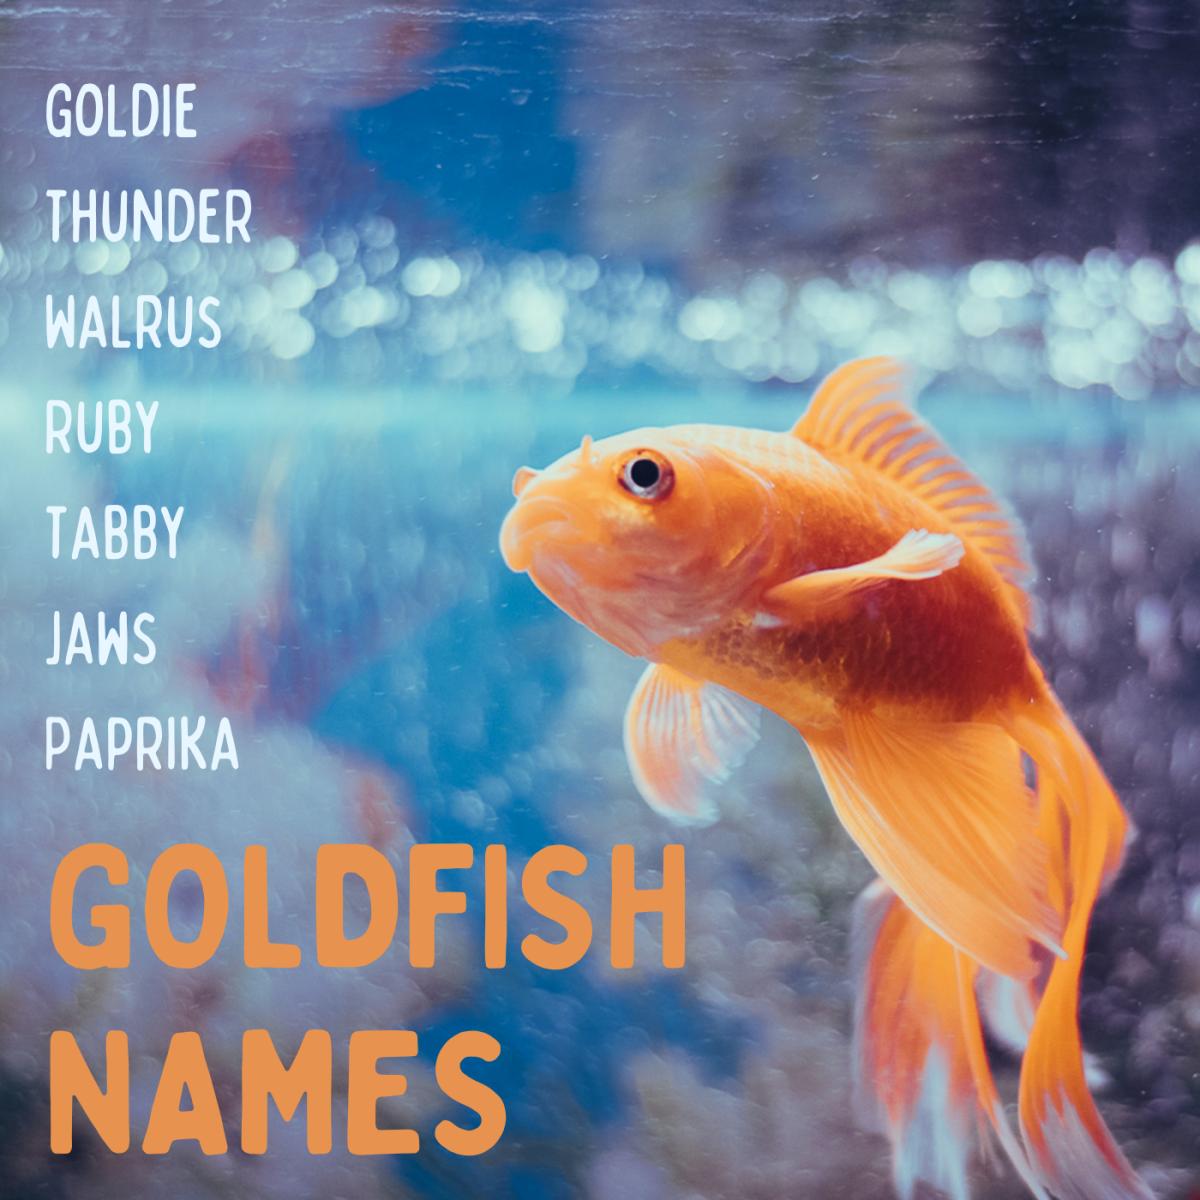 50+ Creative Goldfish Names From Blaze to Twinkie